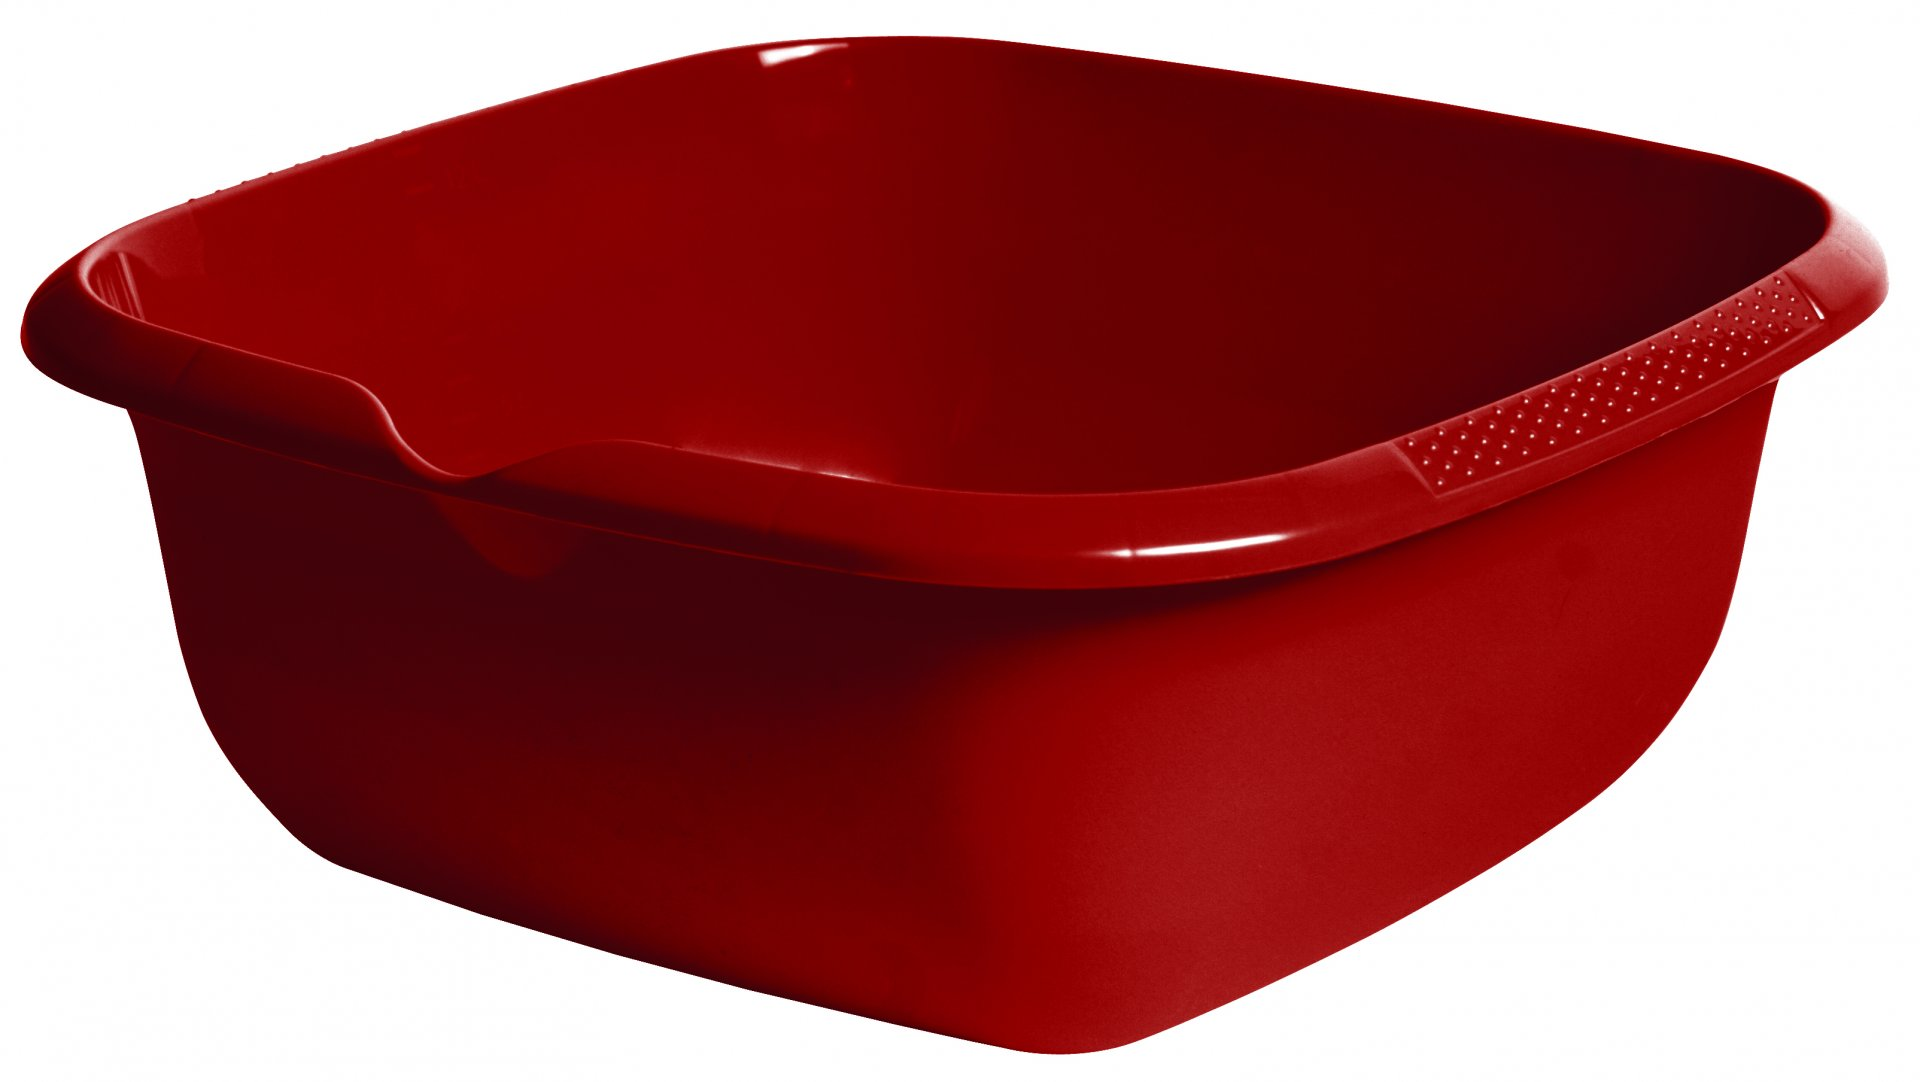 Keeeper miska čtvercová s výlevkou, björk, červená 13l